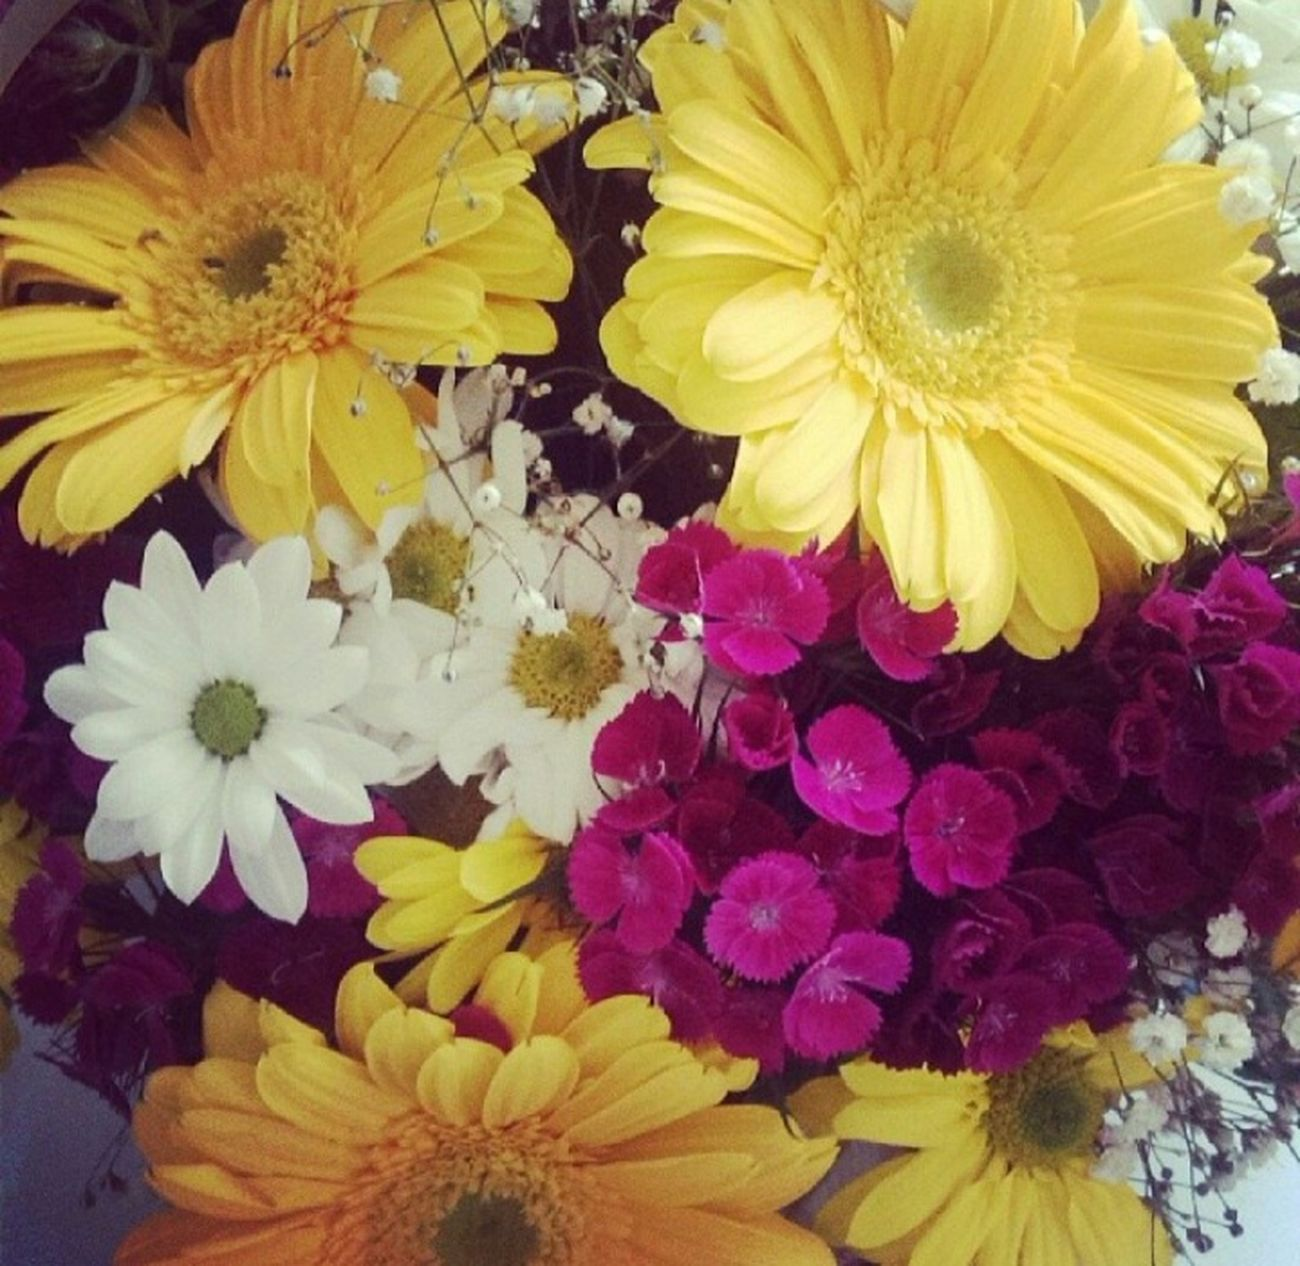 süpriz papatyalarımla günaydın😊 EyeEm Flower First Eyeem Photo Faces Of EyeEm Taking Photos Hi! Eyem Gallery EyeEm Best Shots Sweethome Justmarried💑 Beautiful Day